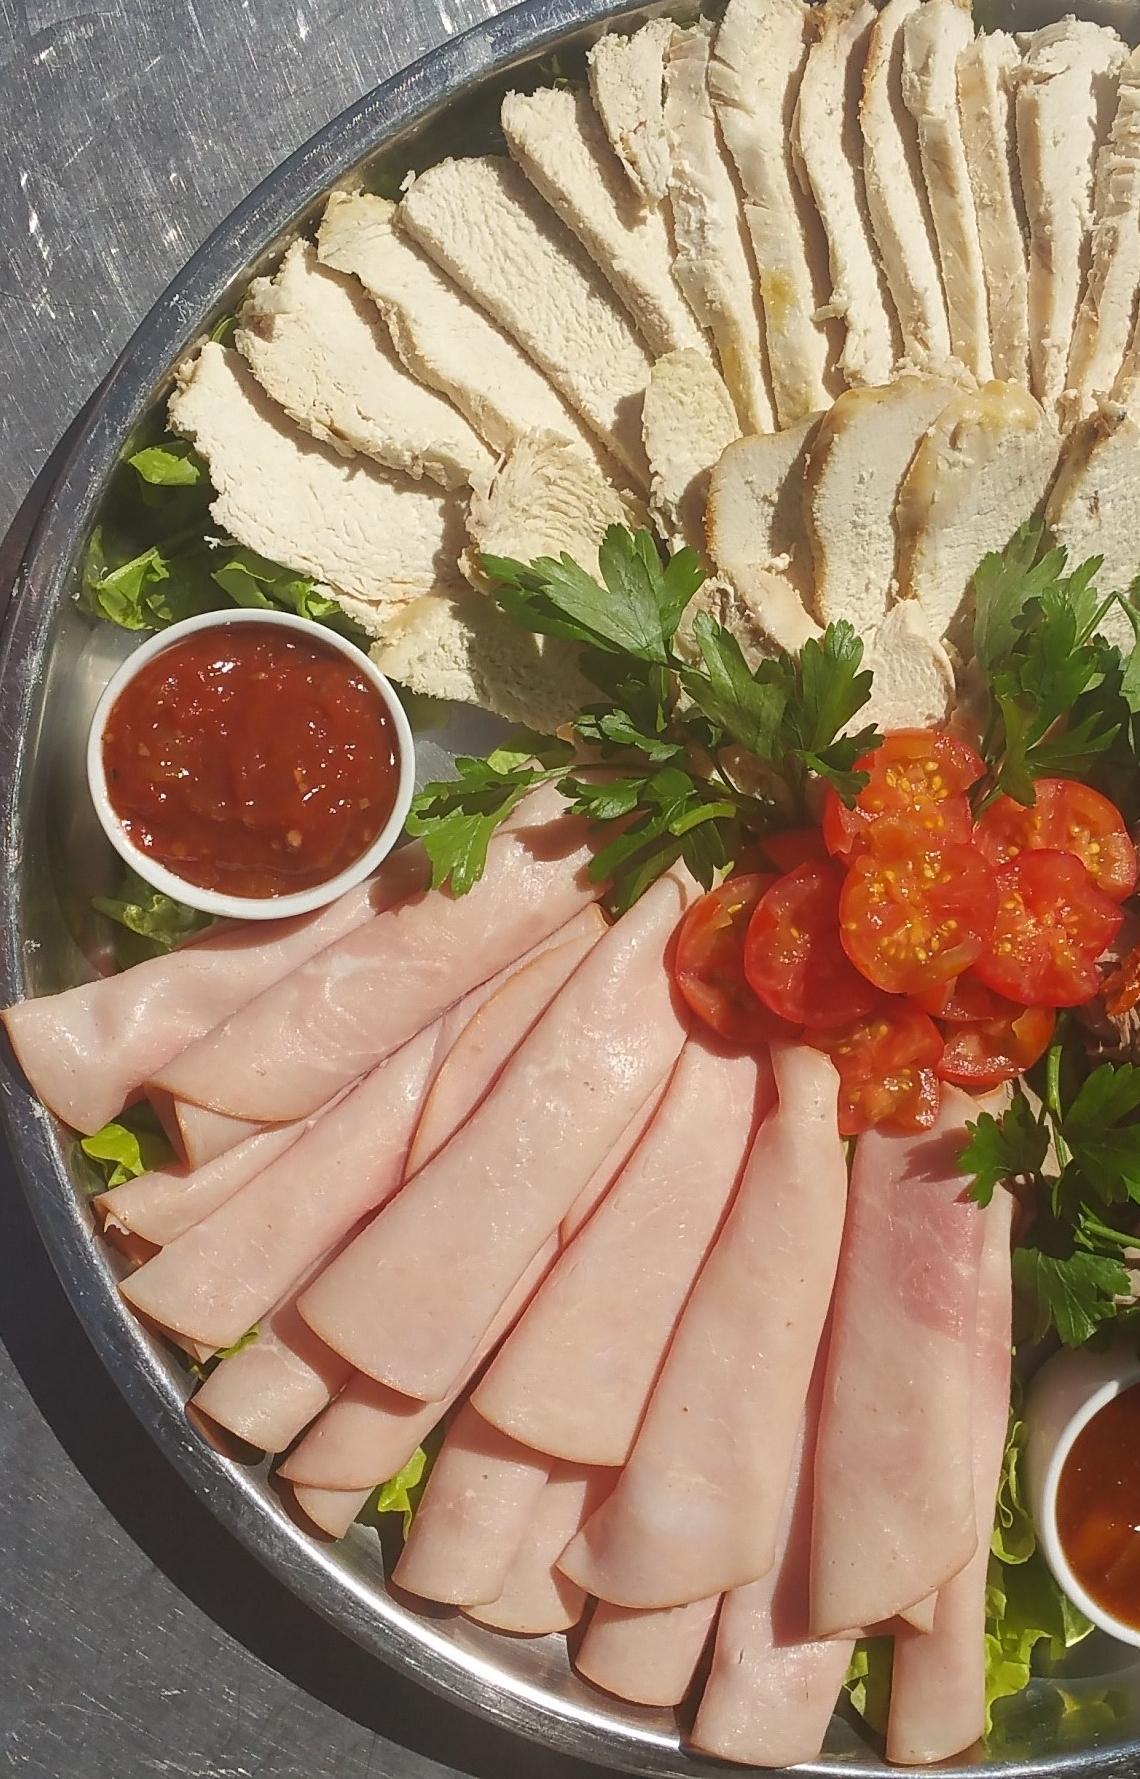 Cold Roast Meats Platter